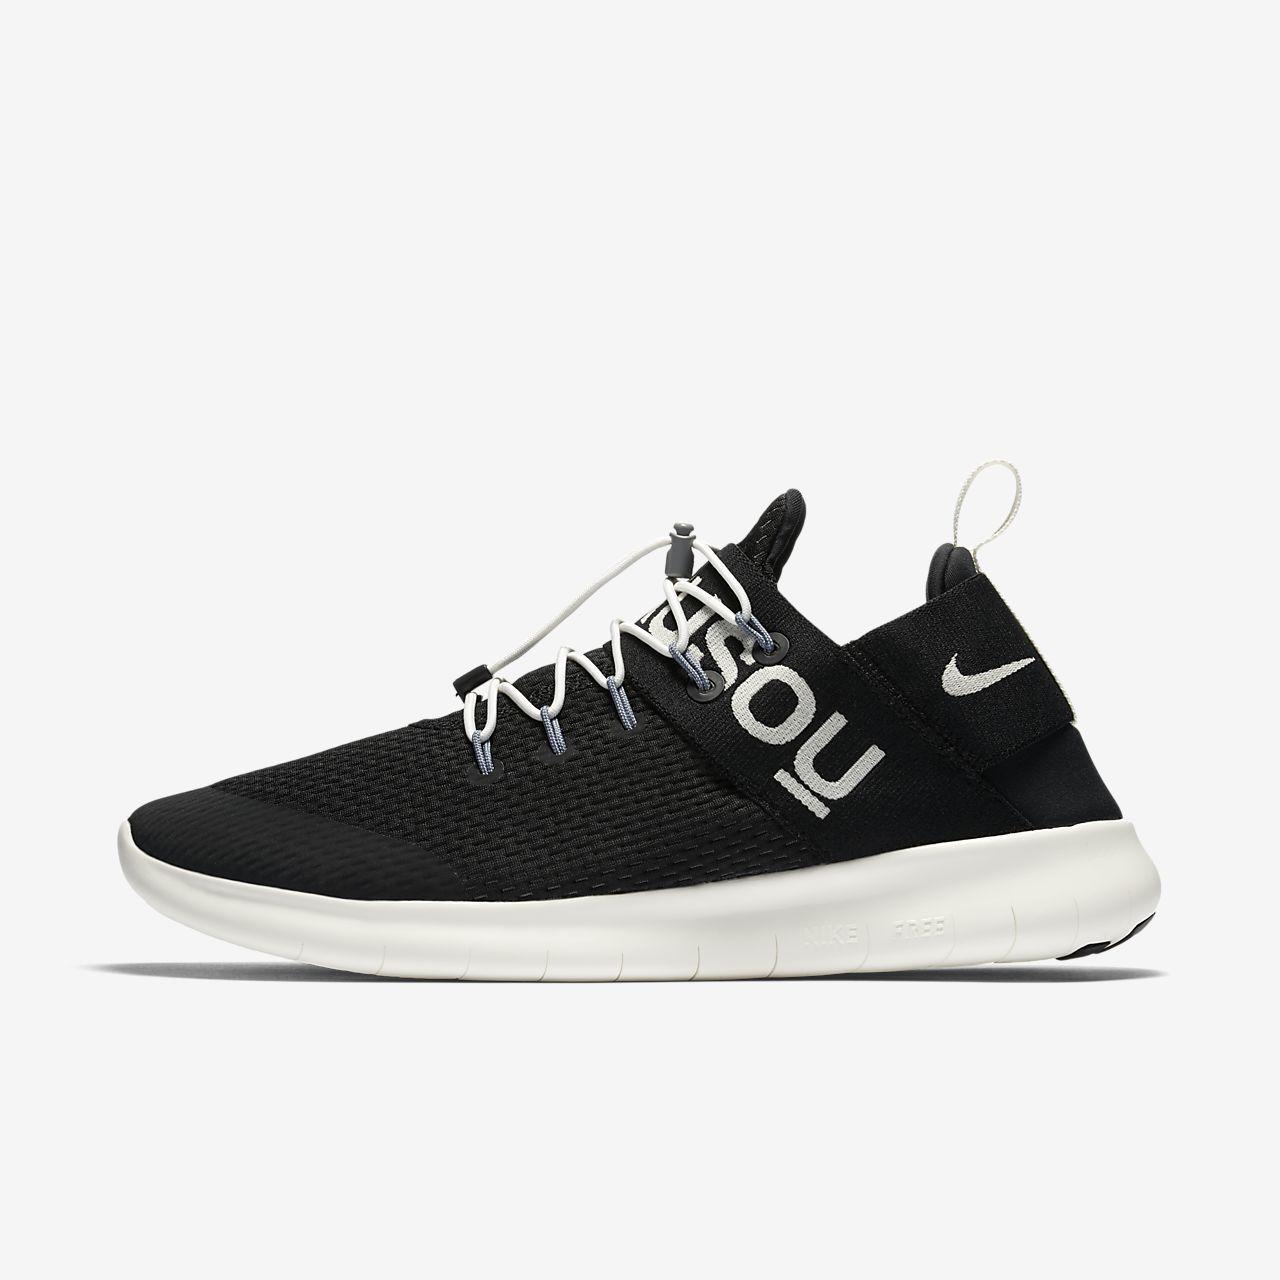 21191e2e7b1b NikeLab Free RN Commuter 2017 Gyakusou Men s Running Shoe